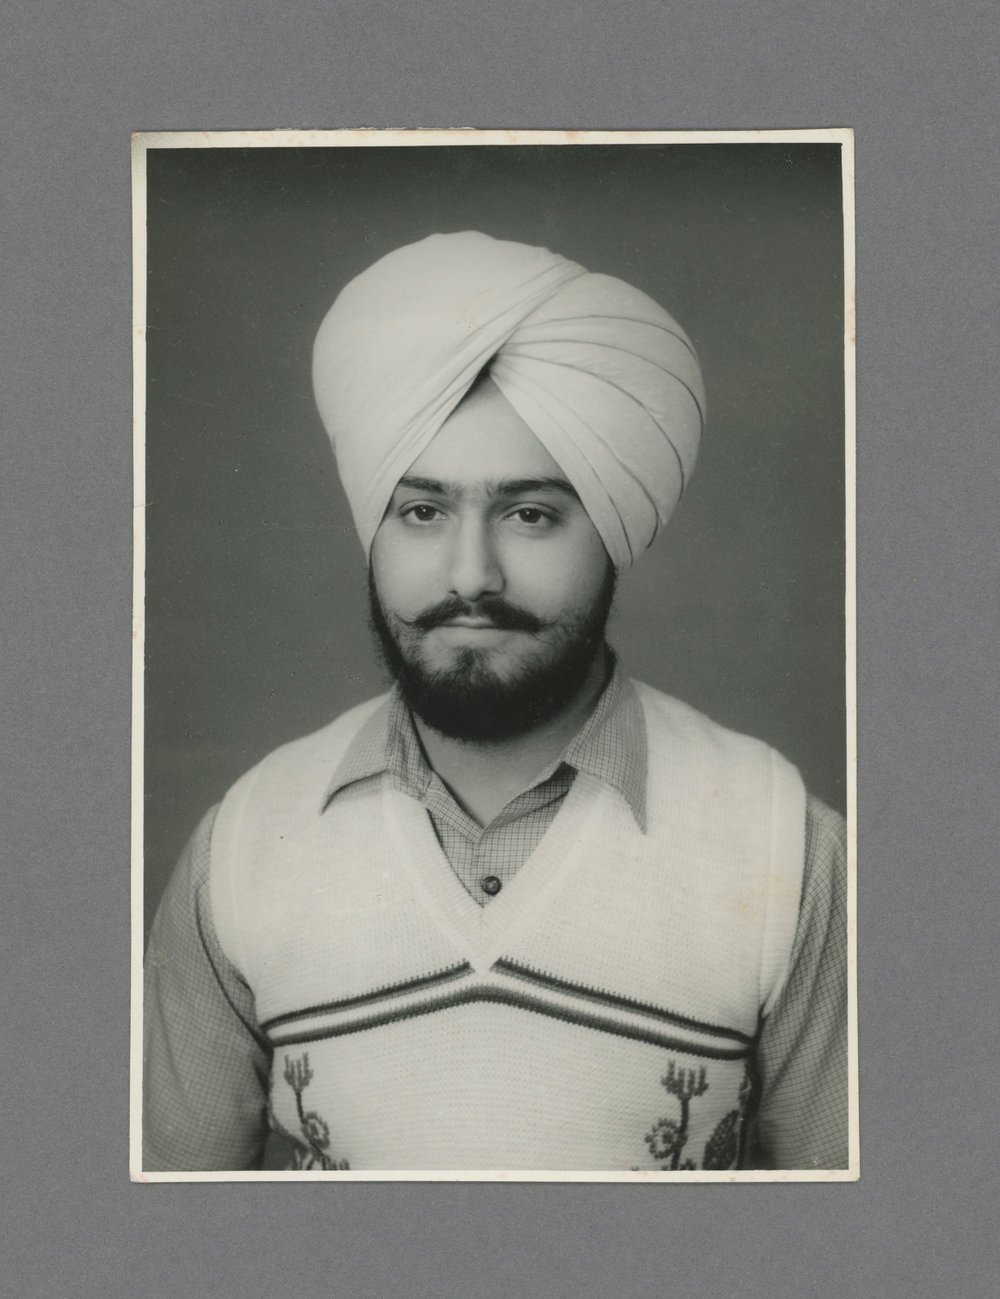 Punjab, India c.1984